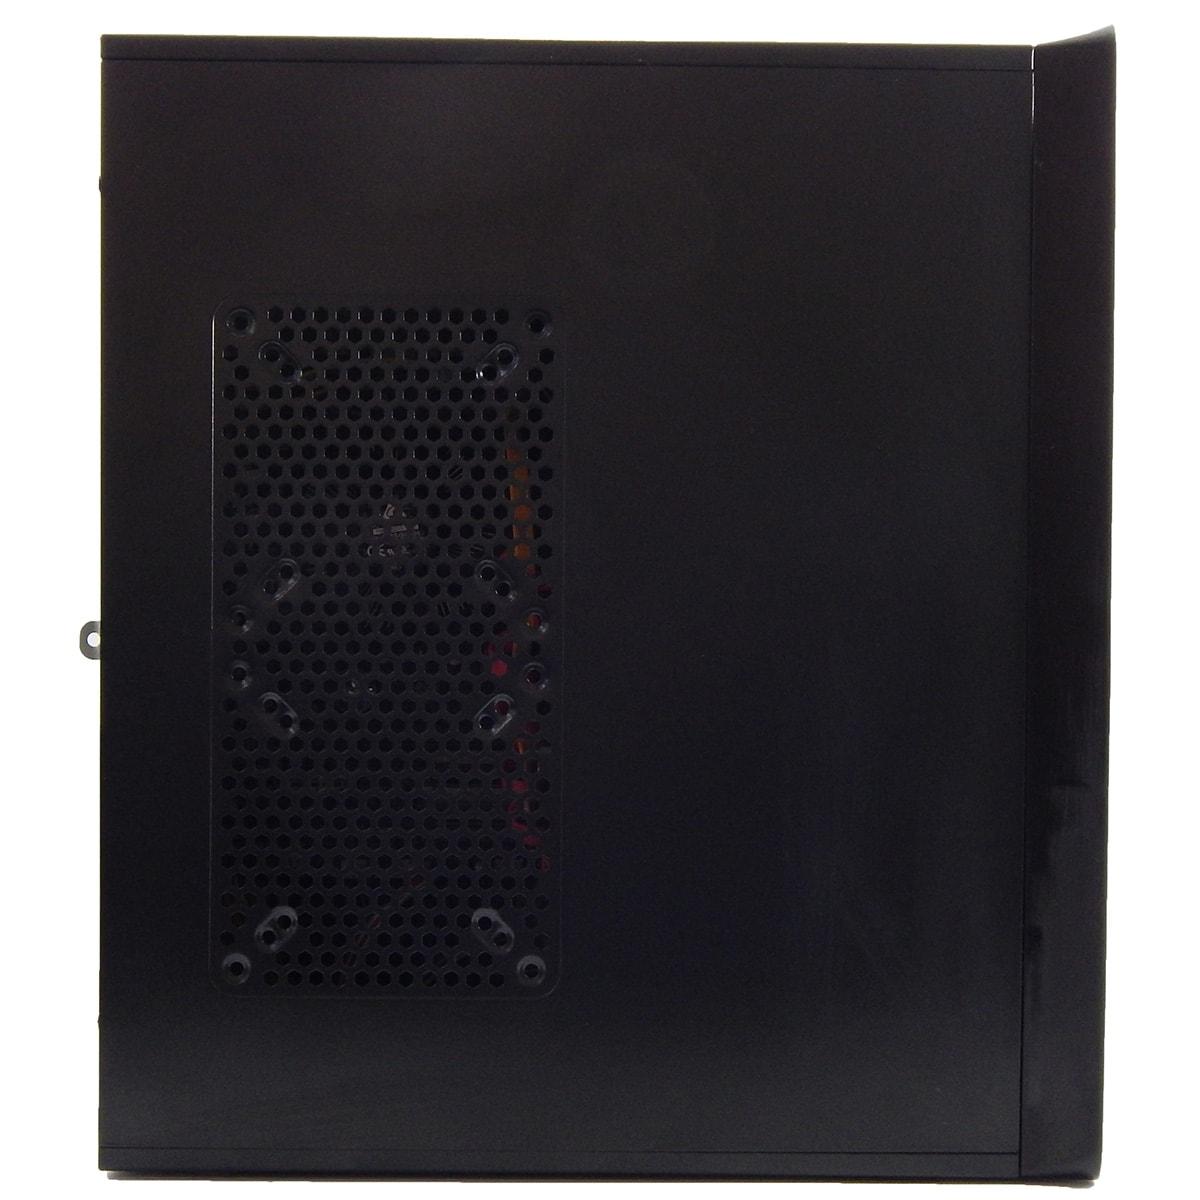 PC POSITIVO PREMIUM DRI7432 I3-4160 8Gb 1Tb Gravador DVD - Reembalado